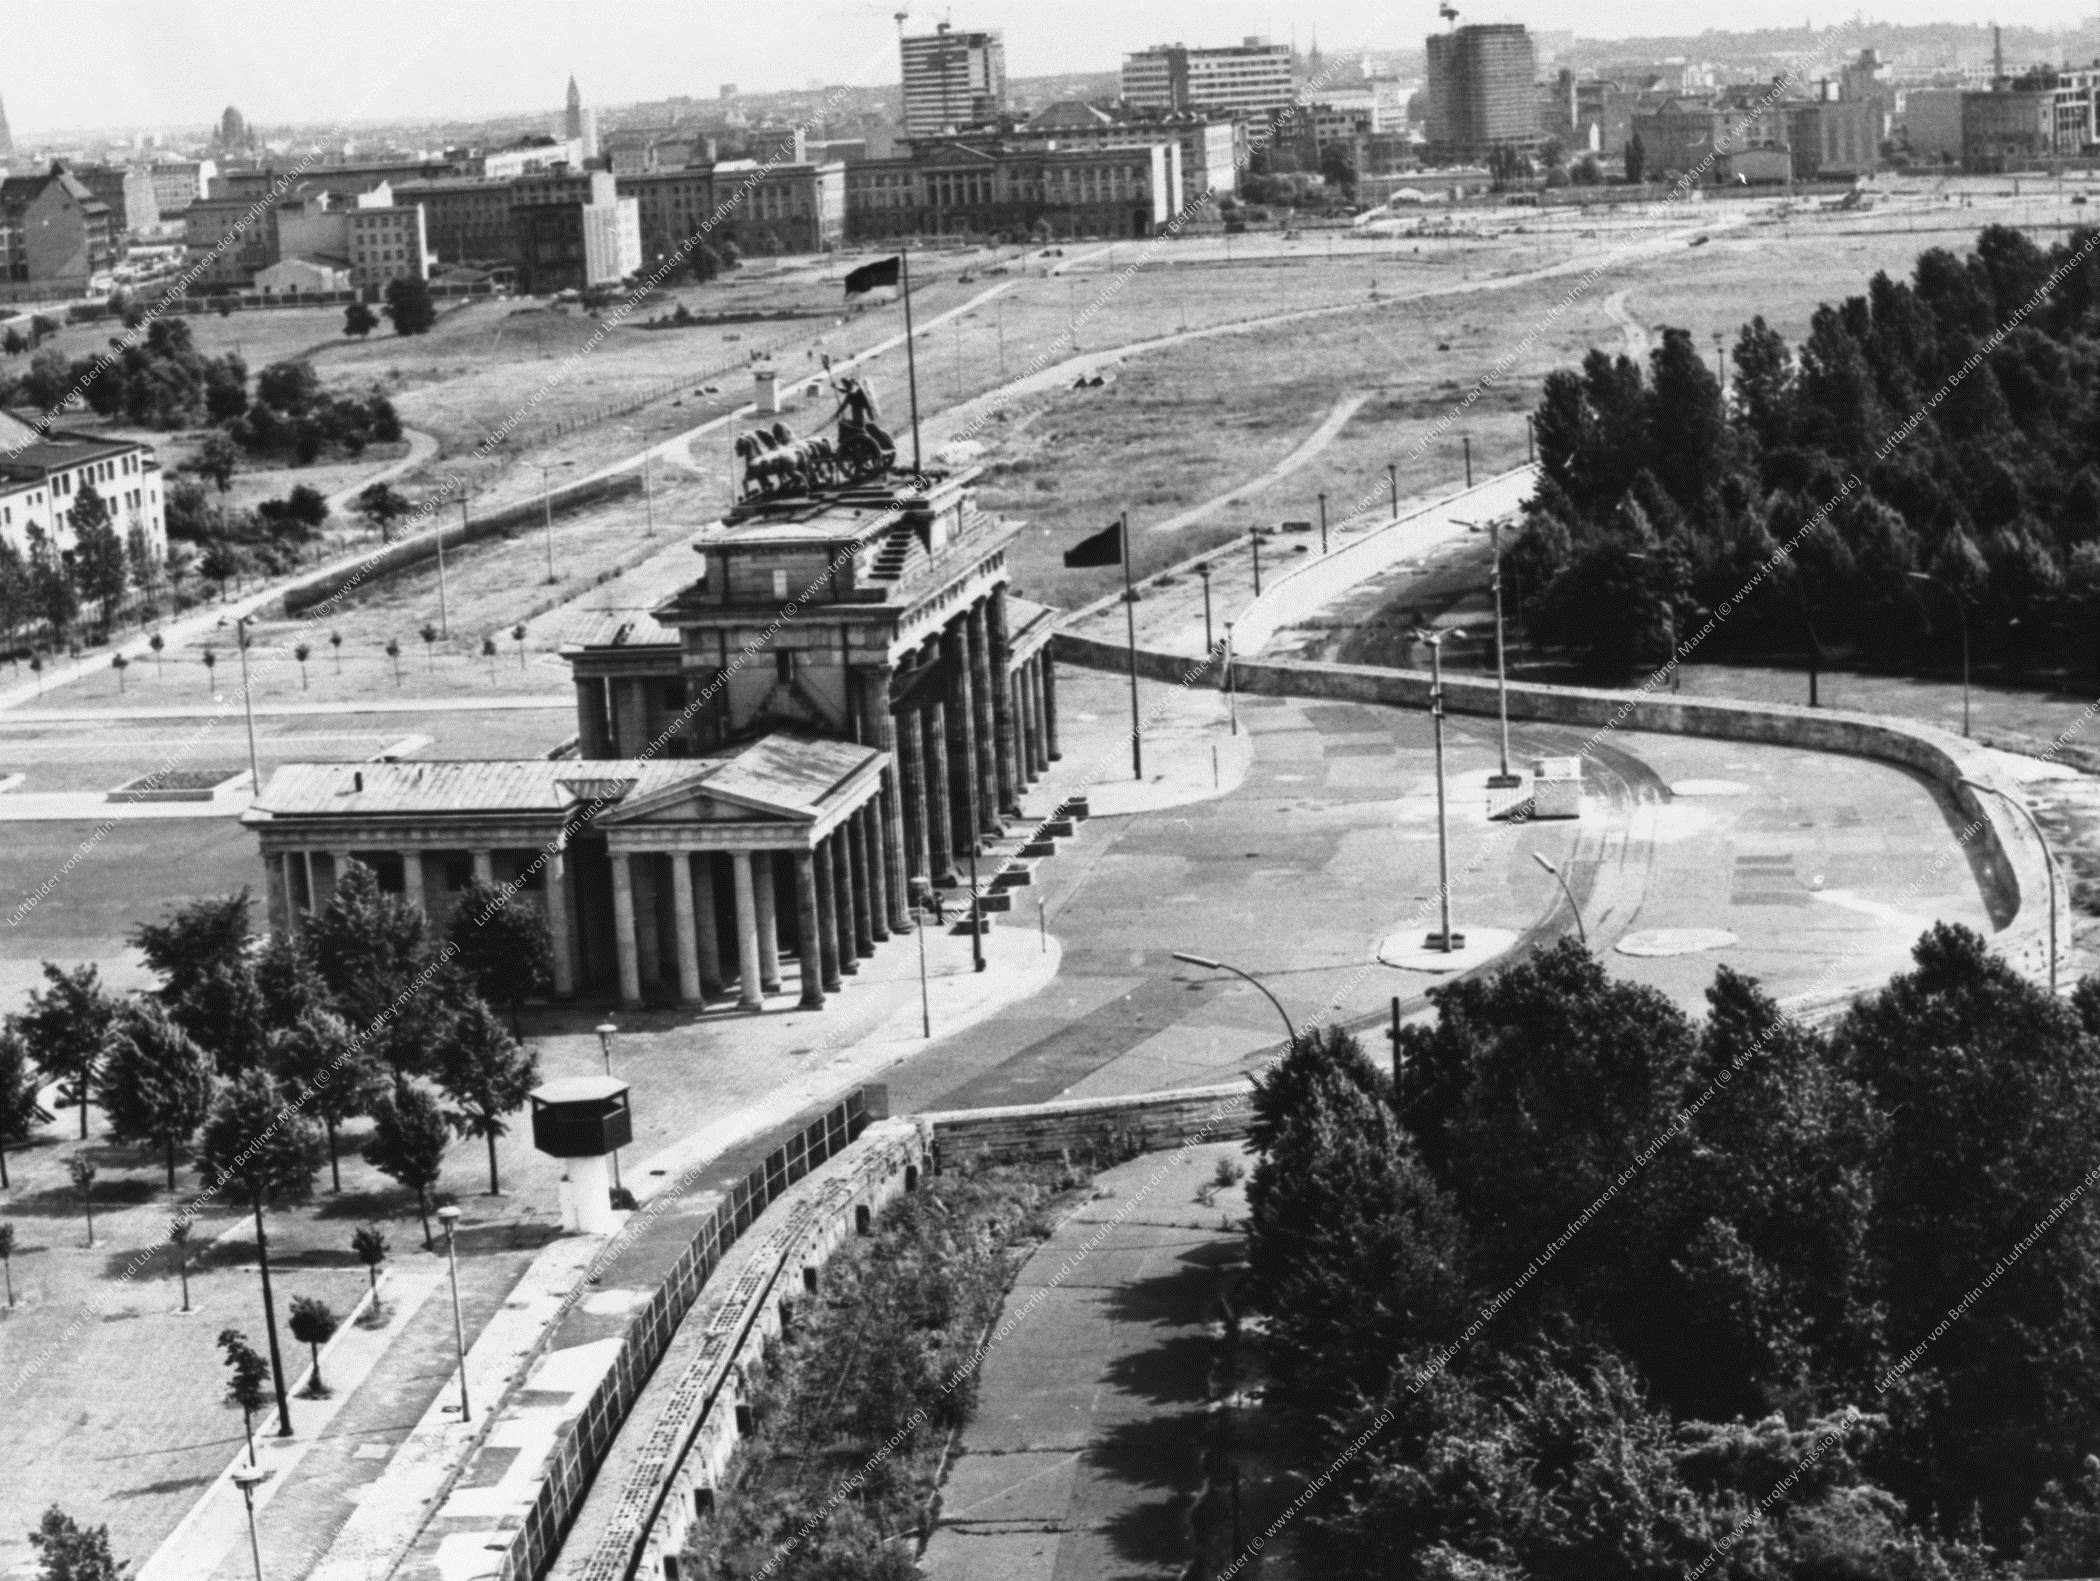 Berlin Luftbild Brandenburger Tor (Bild 013)